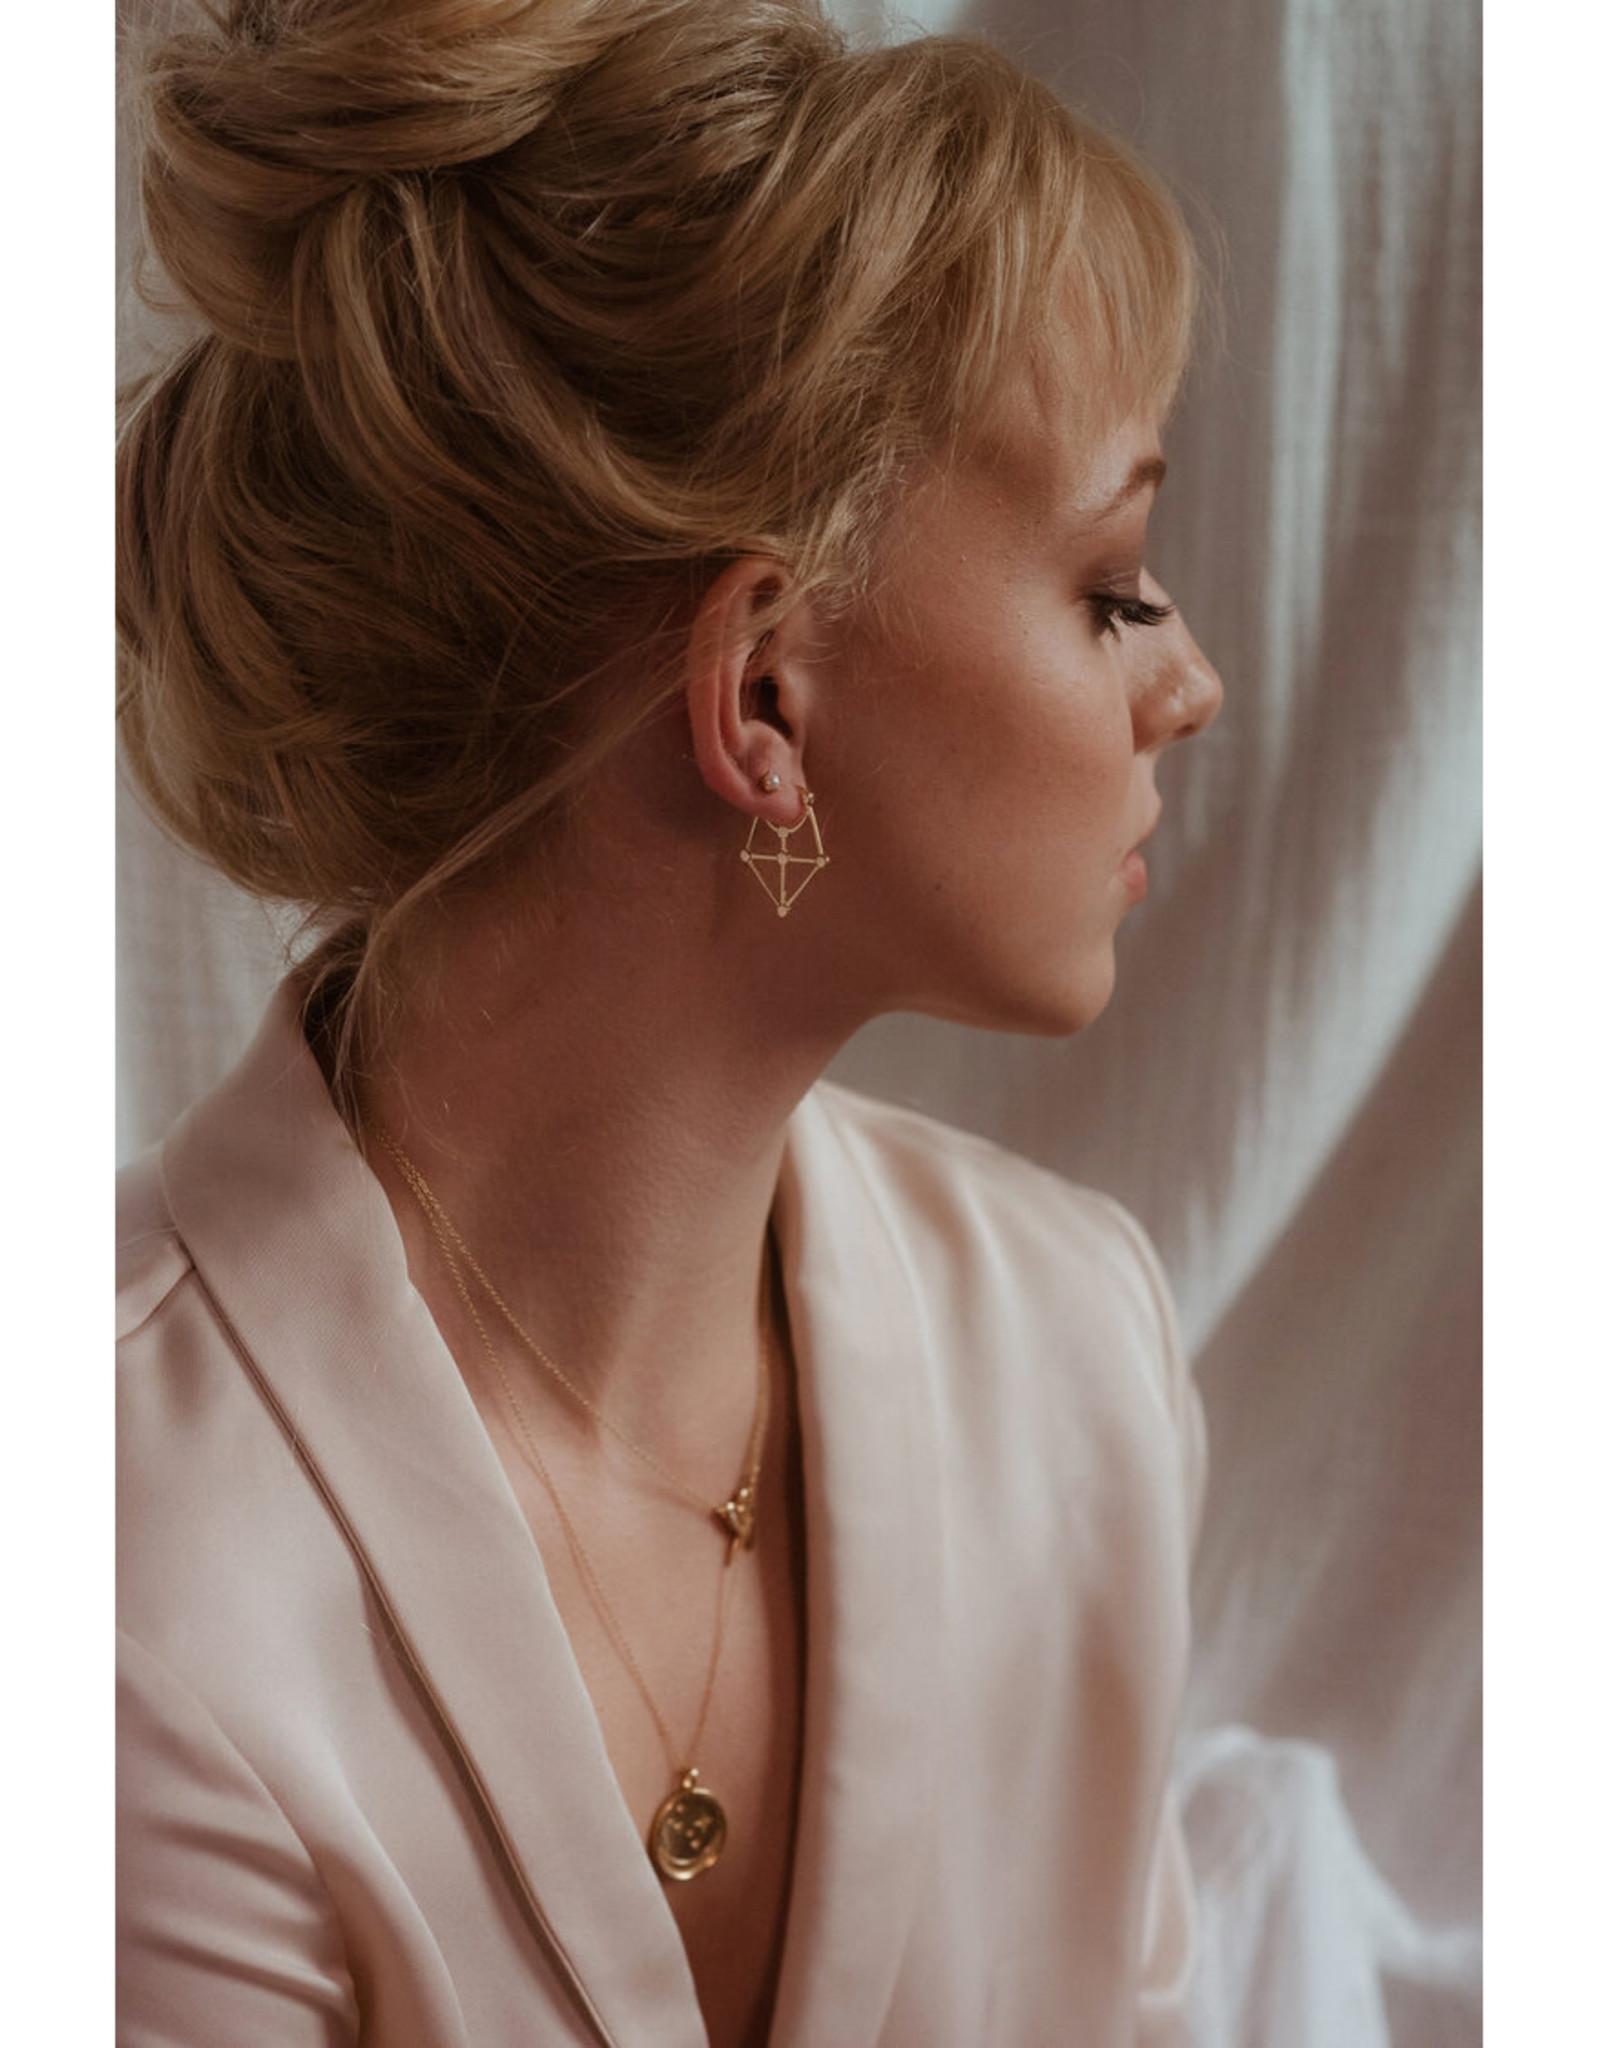 Sarah Mulder Jewelry Gold Cassie Studs - Onyx